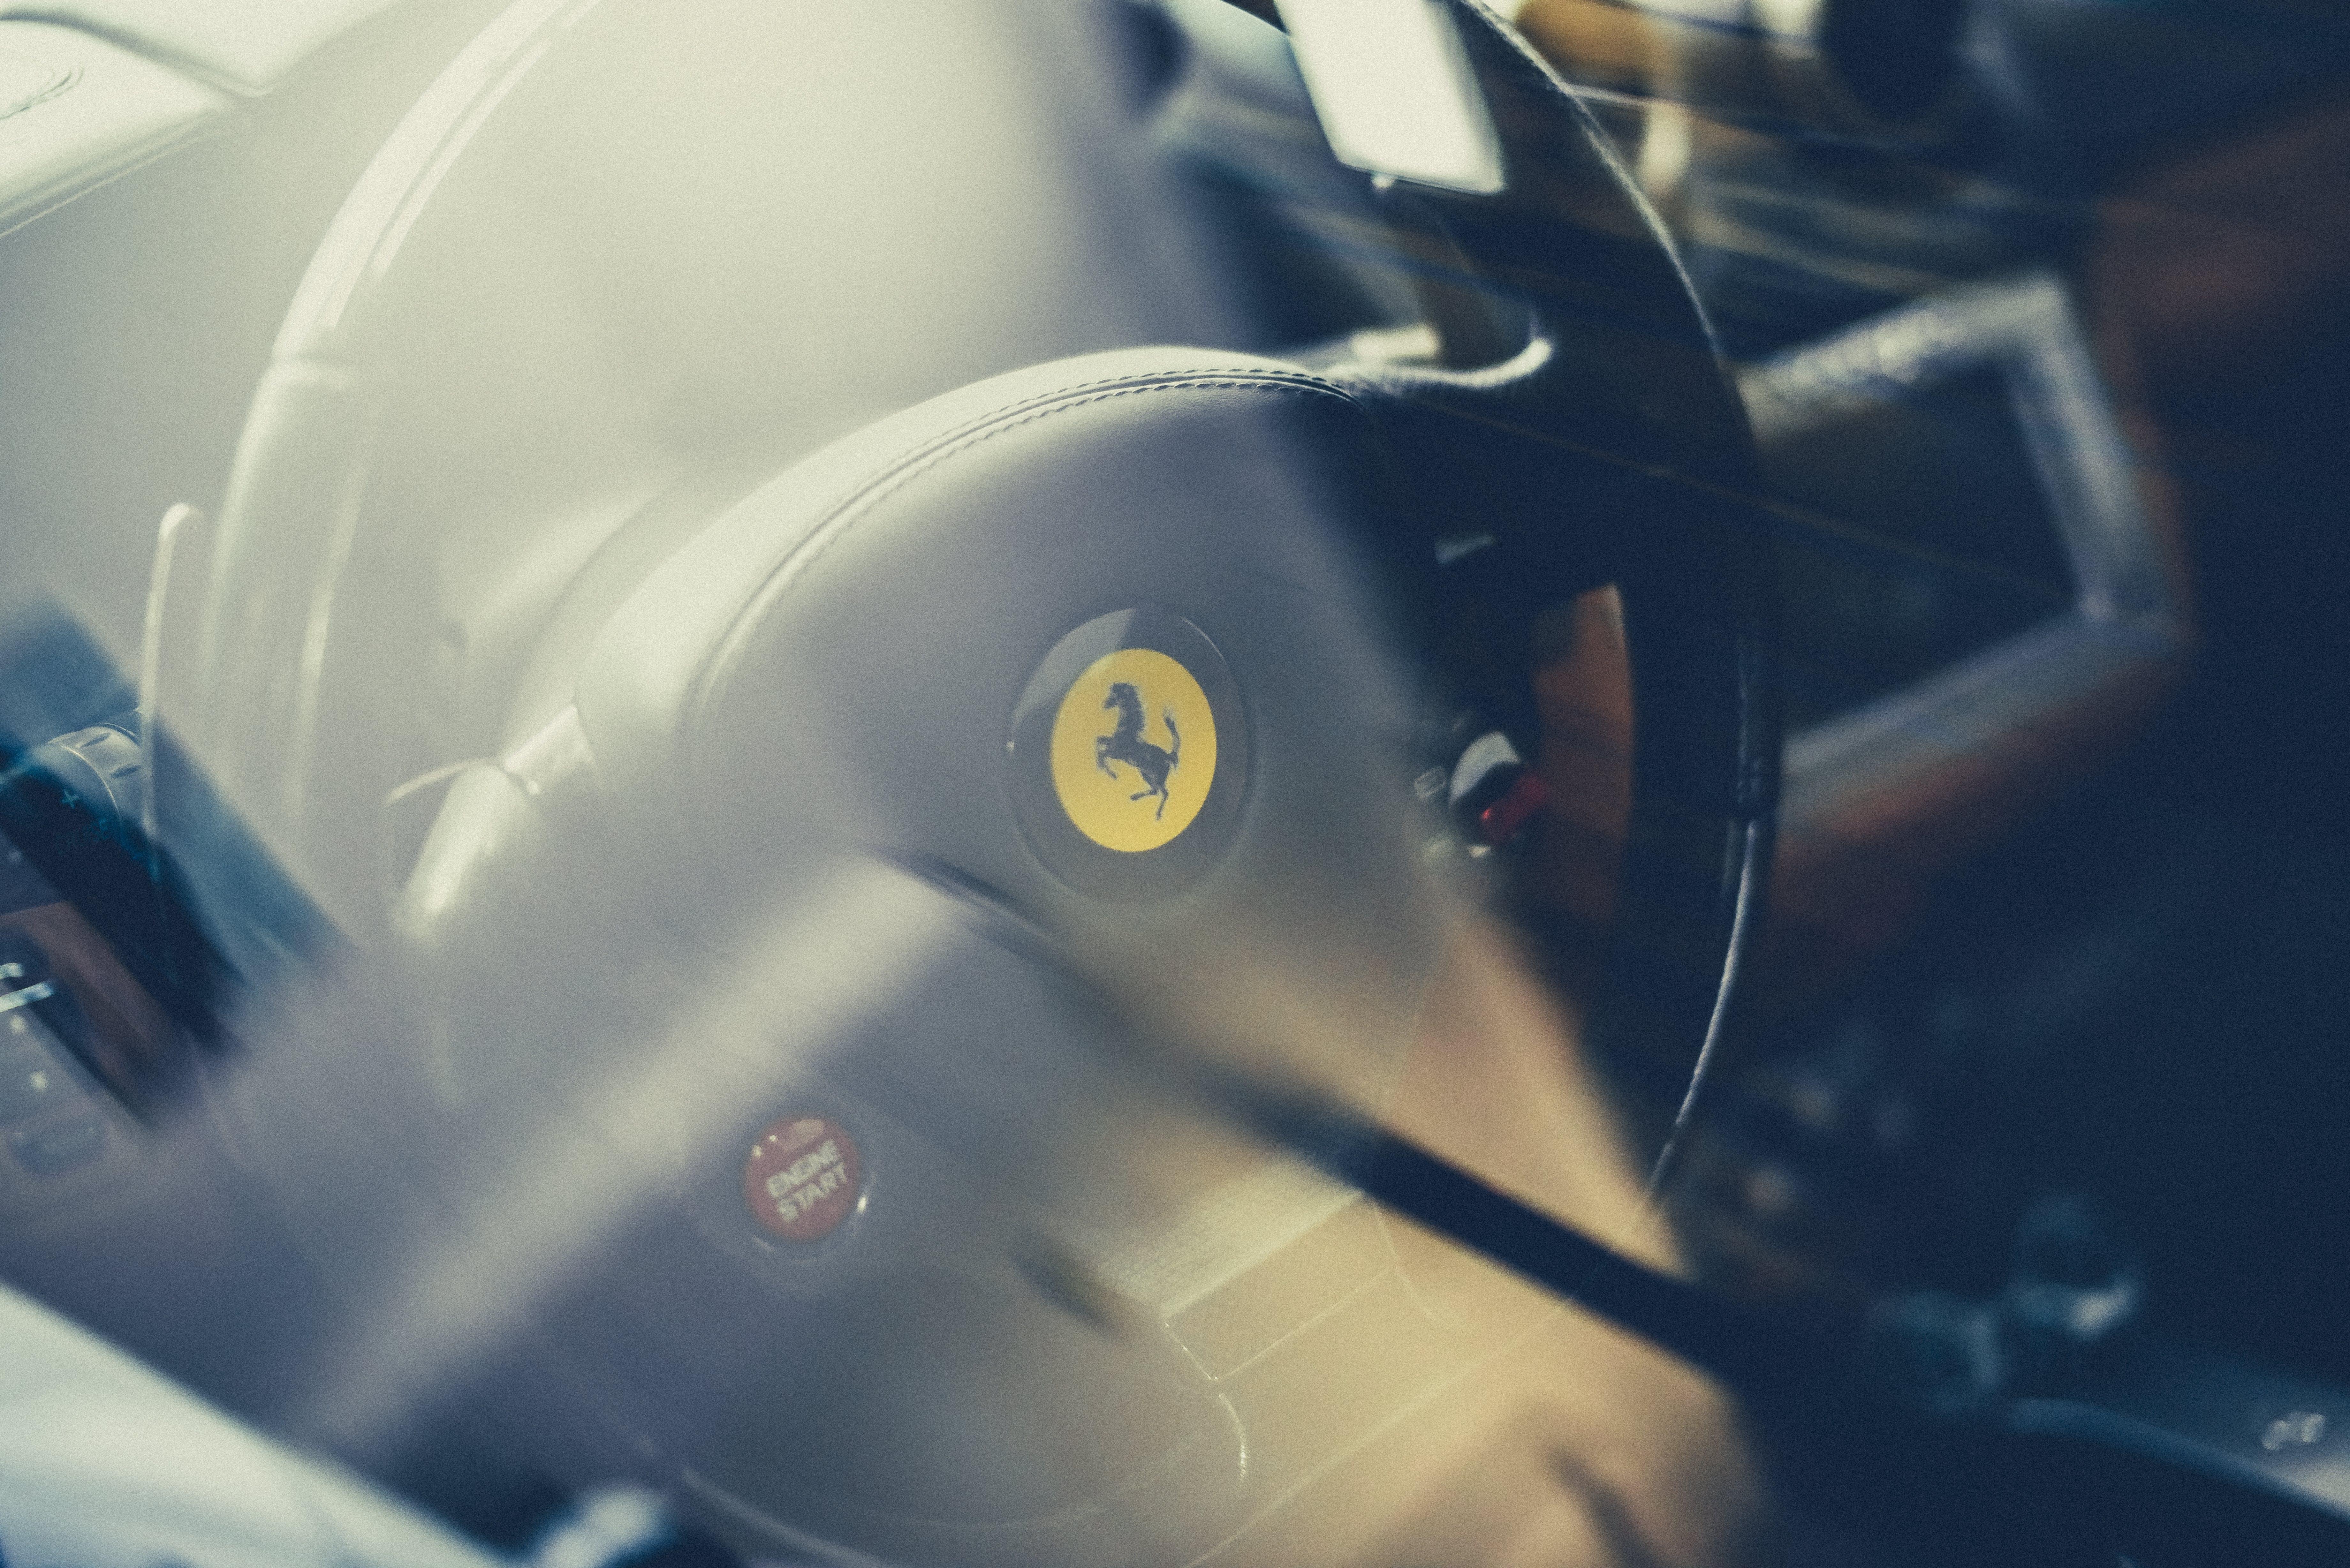 Free stock photo of car, Ferrari, glass, logo